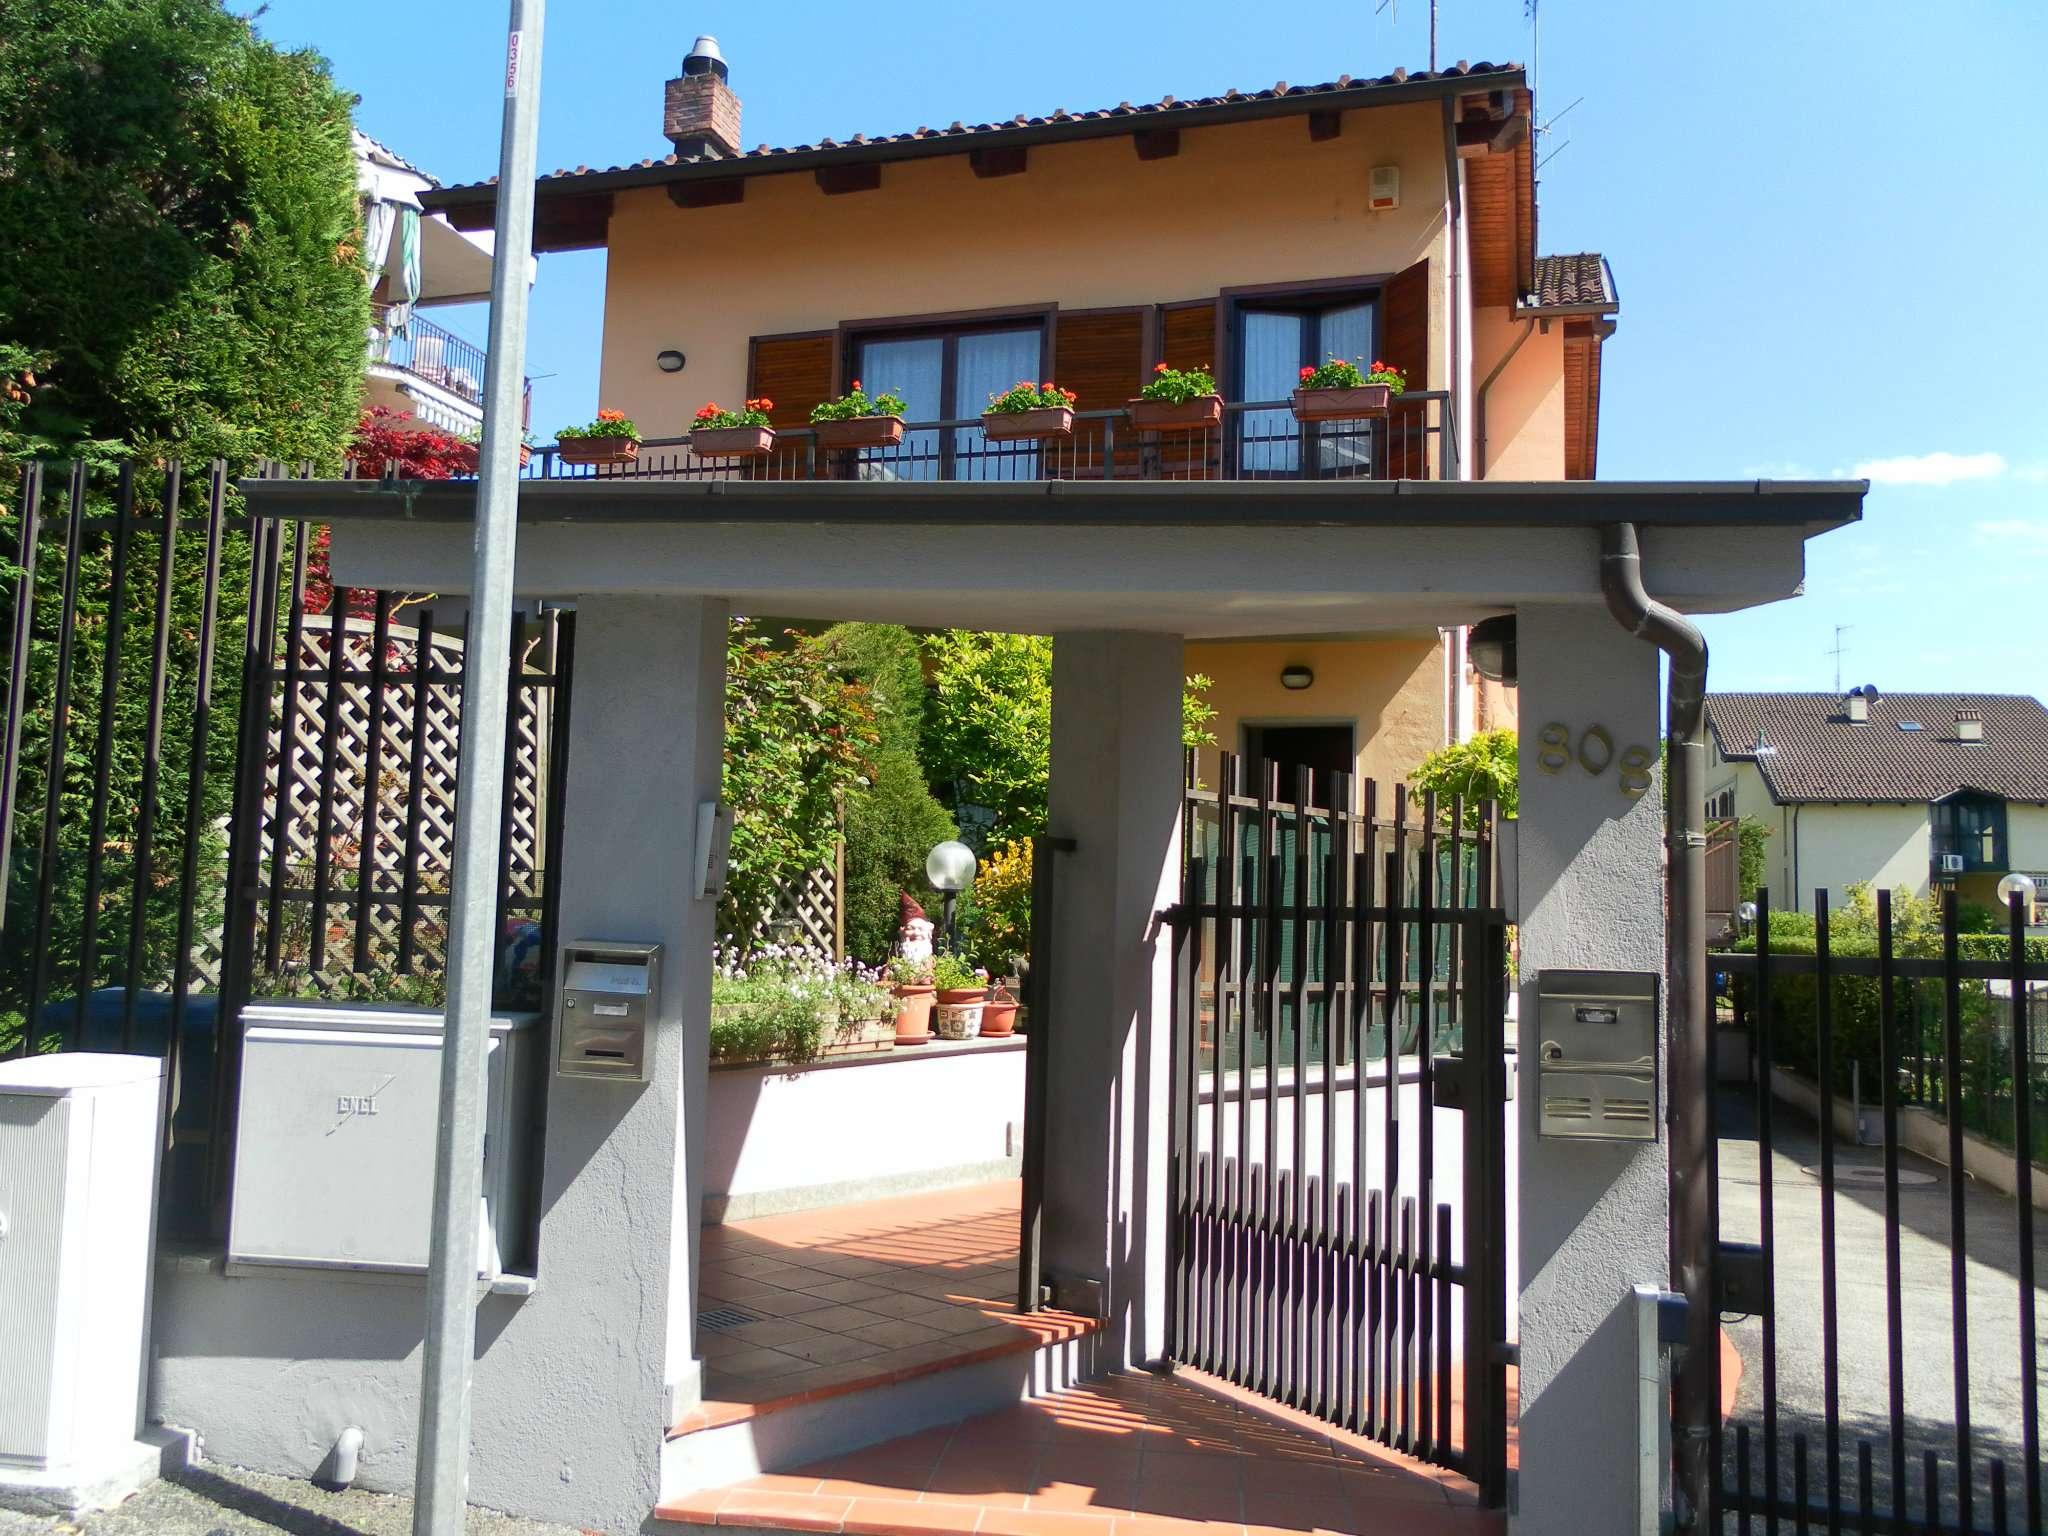 VENDITE Rustici e Case Moncalieri 3838007